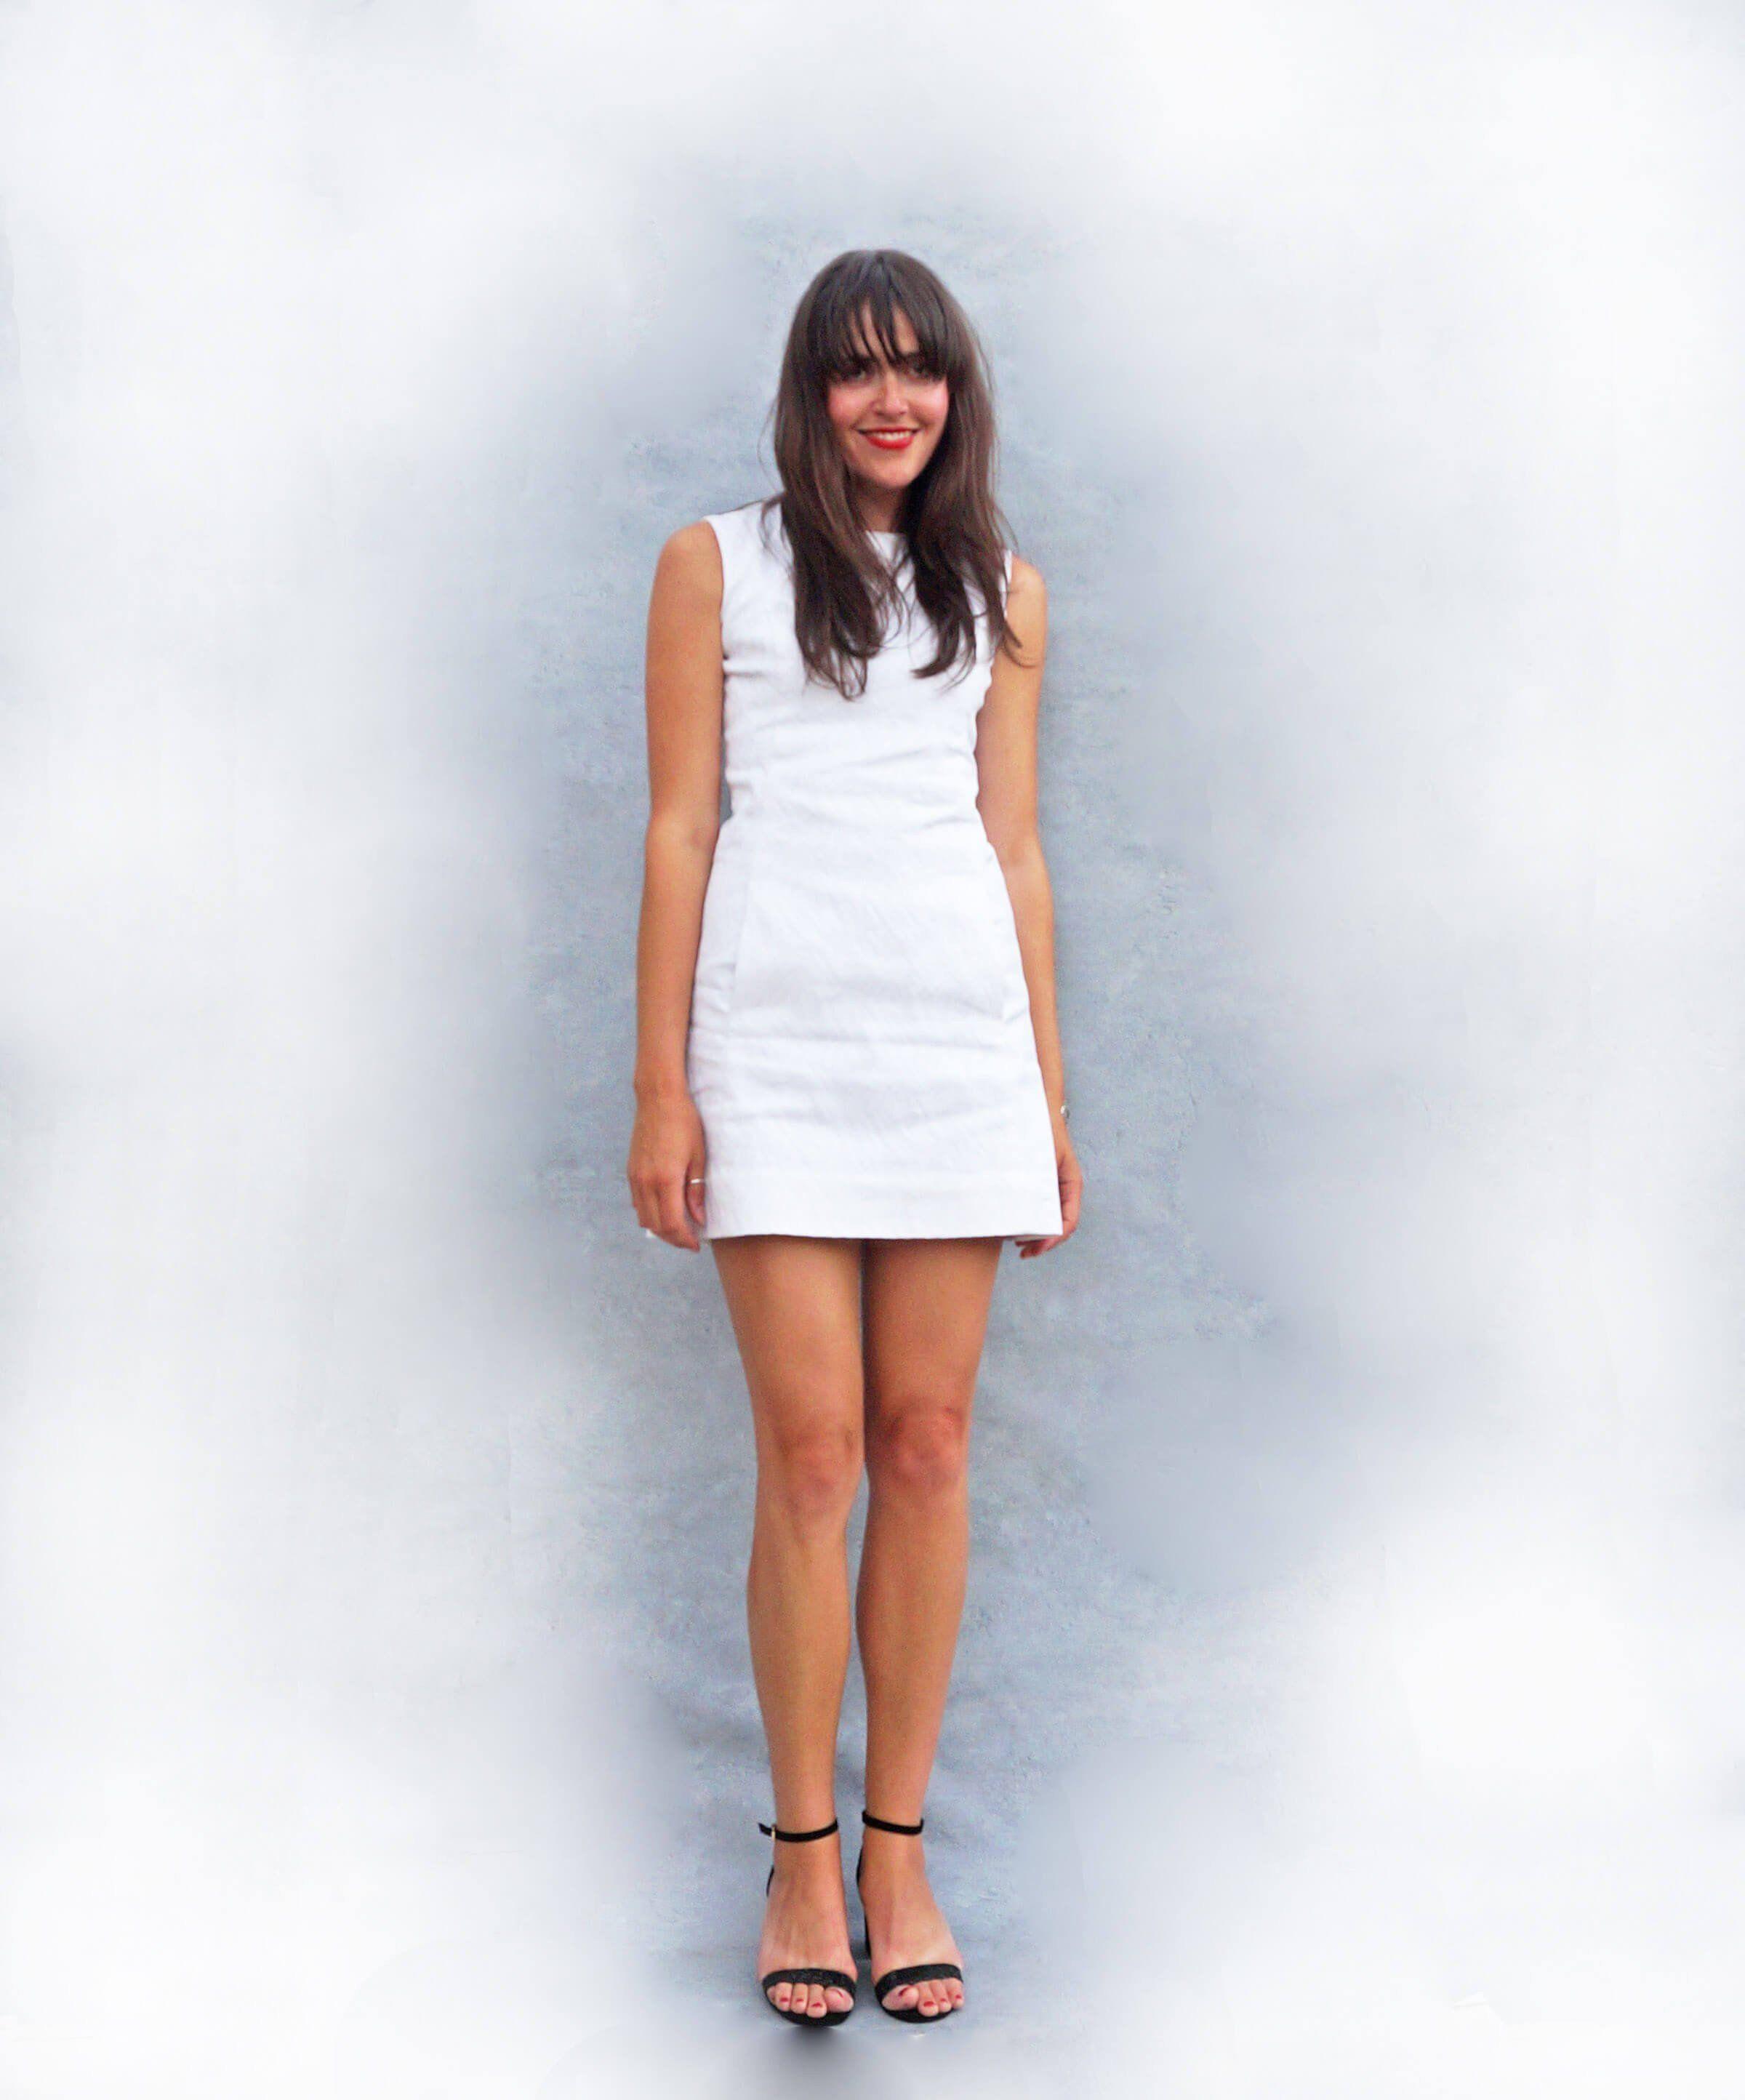 723e7c118101a White Vintage 60s Mod Mini Dress